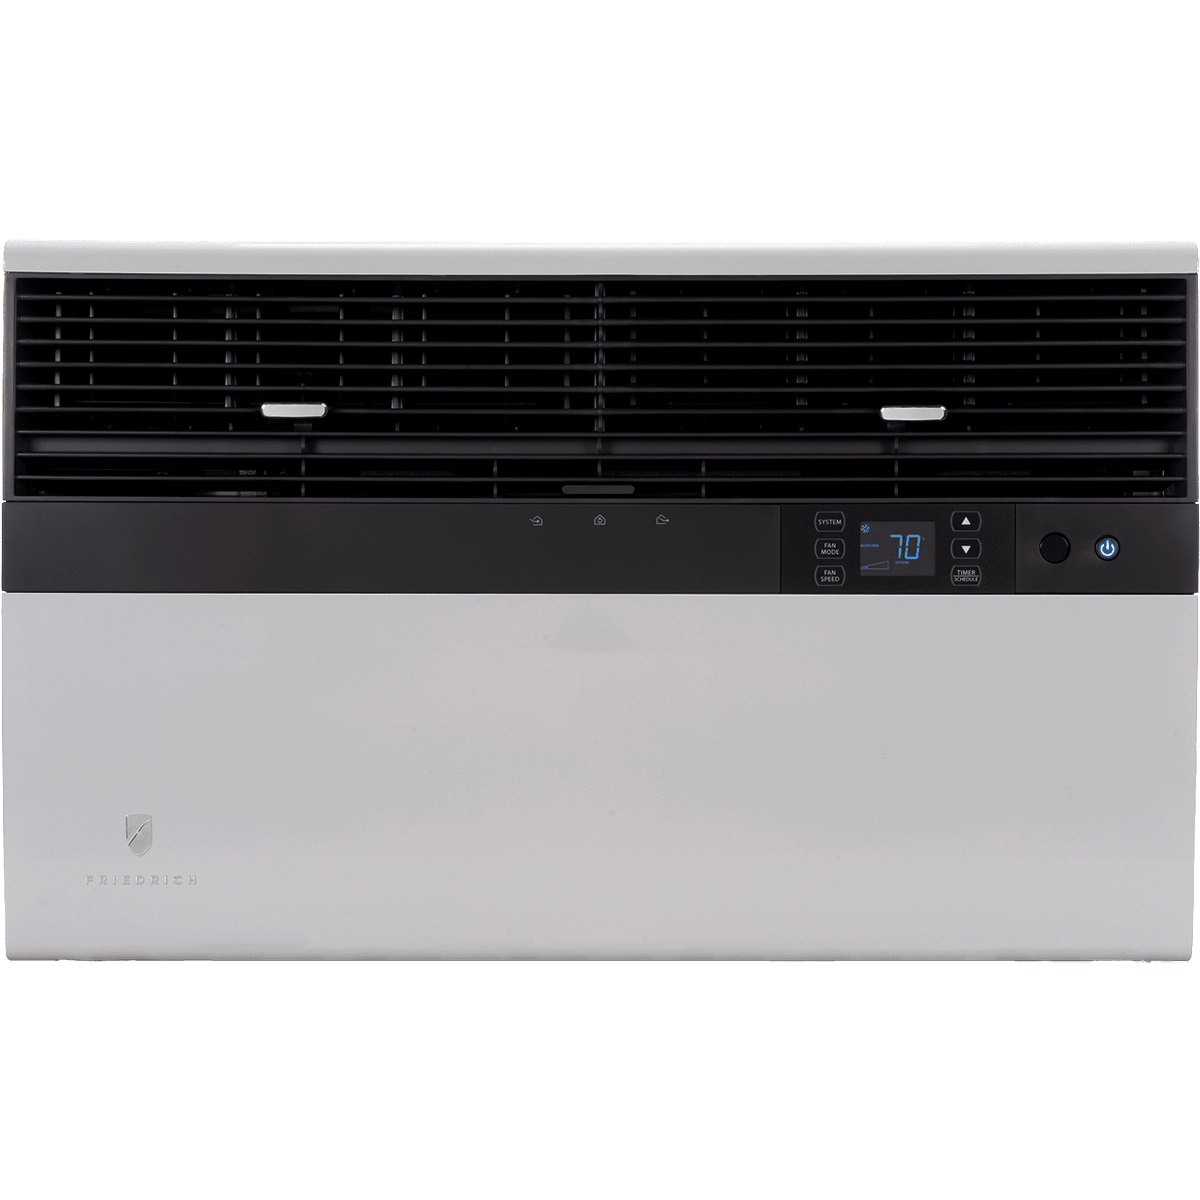 Friedrich Kuhl SS12N10C 12,000 BTU Window Air Conditioner